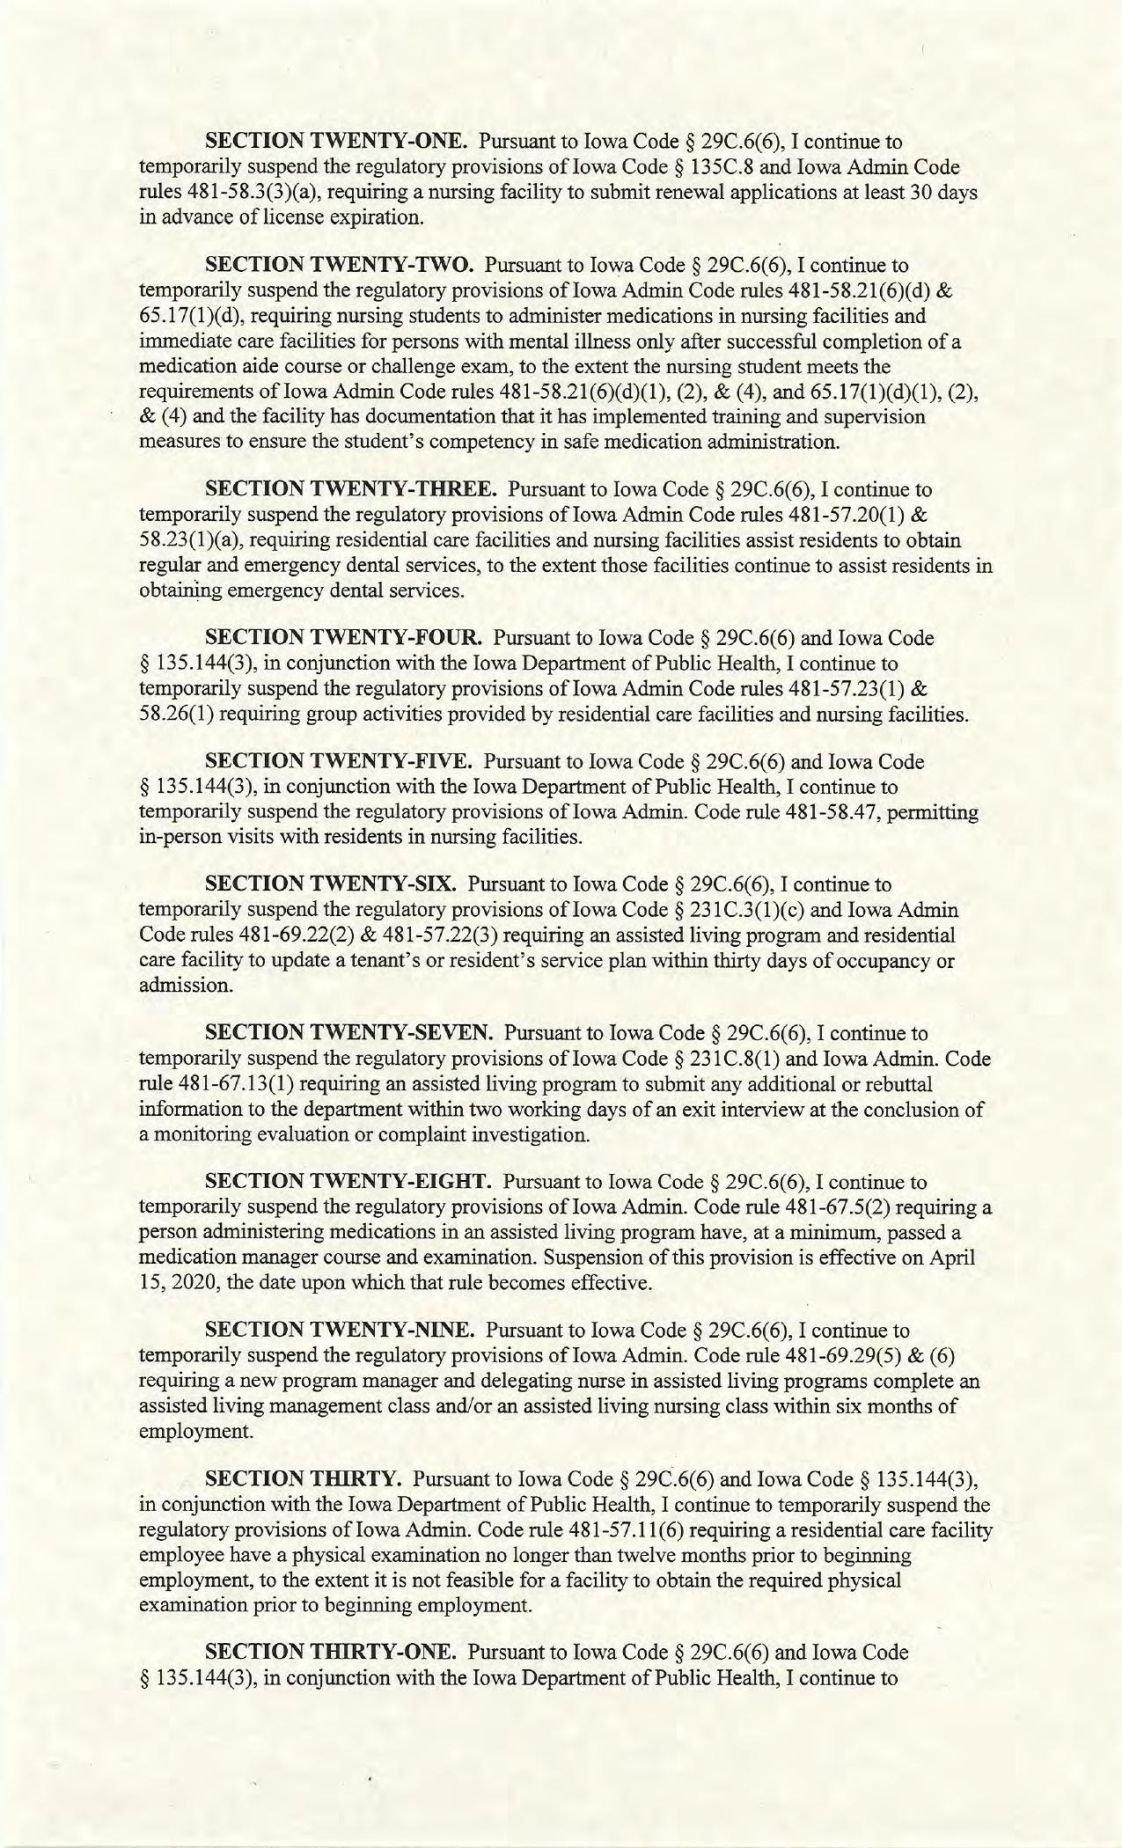 Public Health Proclamation - 2020.04.27 - Pt 2.pdf